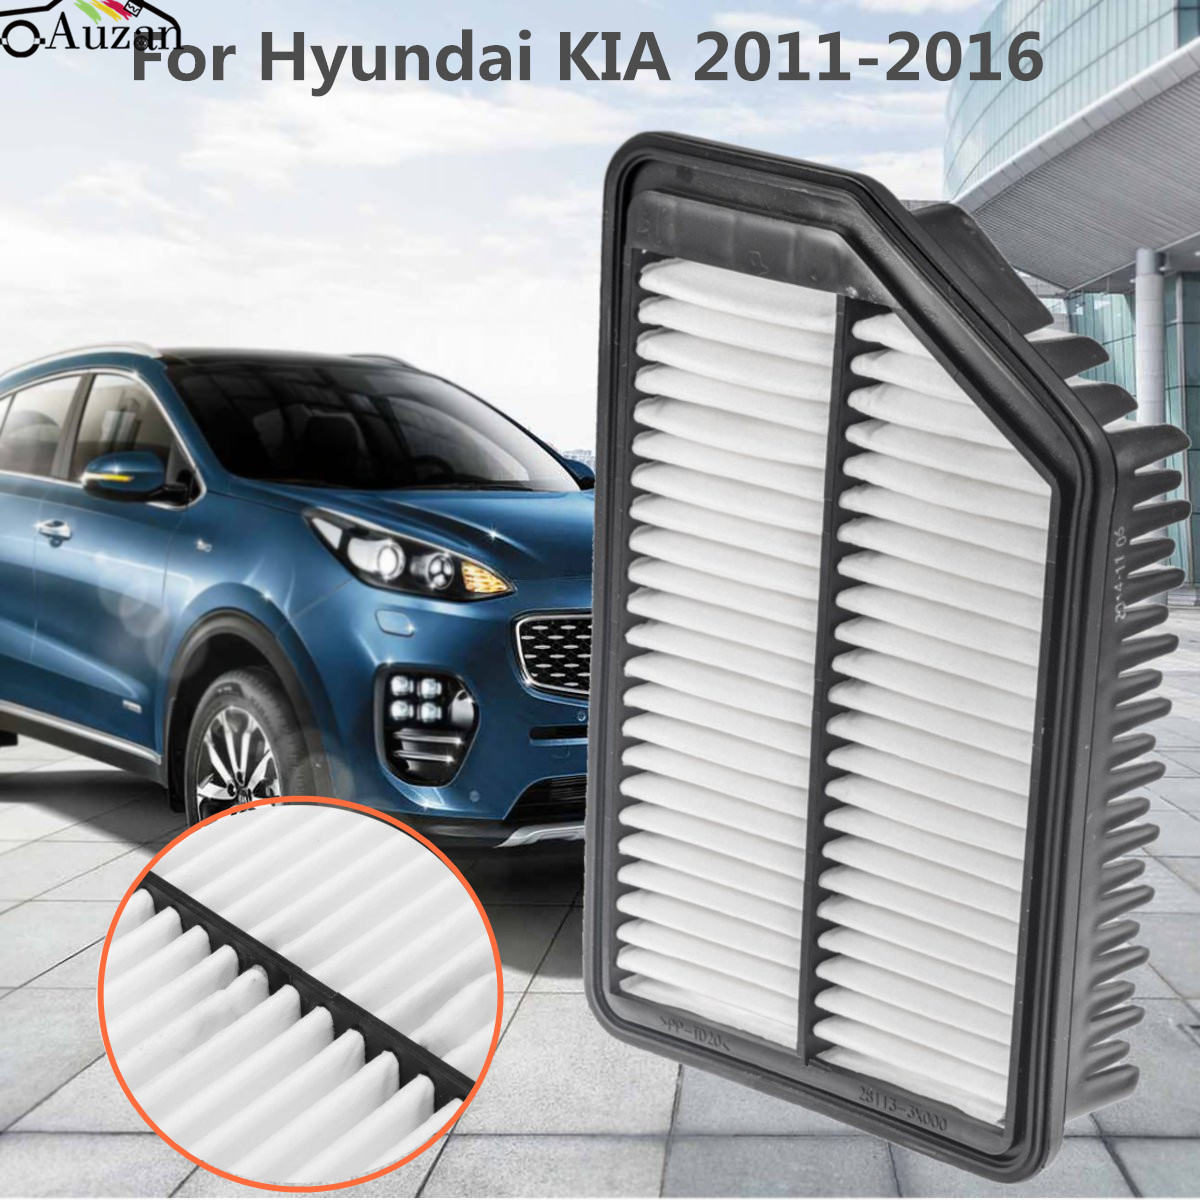 KIA OPTIMA COMBO CABIN /& AIR FILTER FOR KIA OPTIMA 2.4L ENGINE 2011-2012